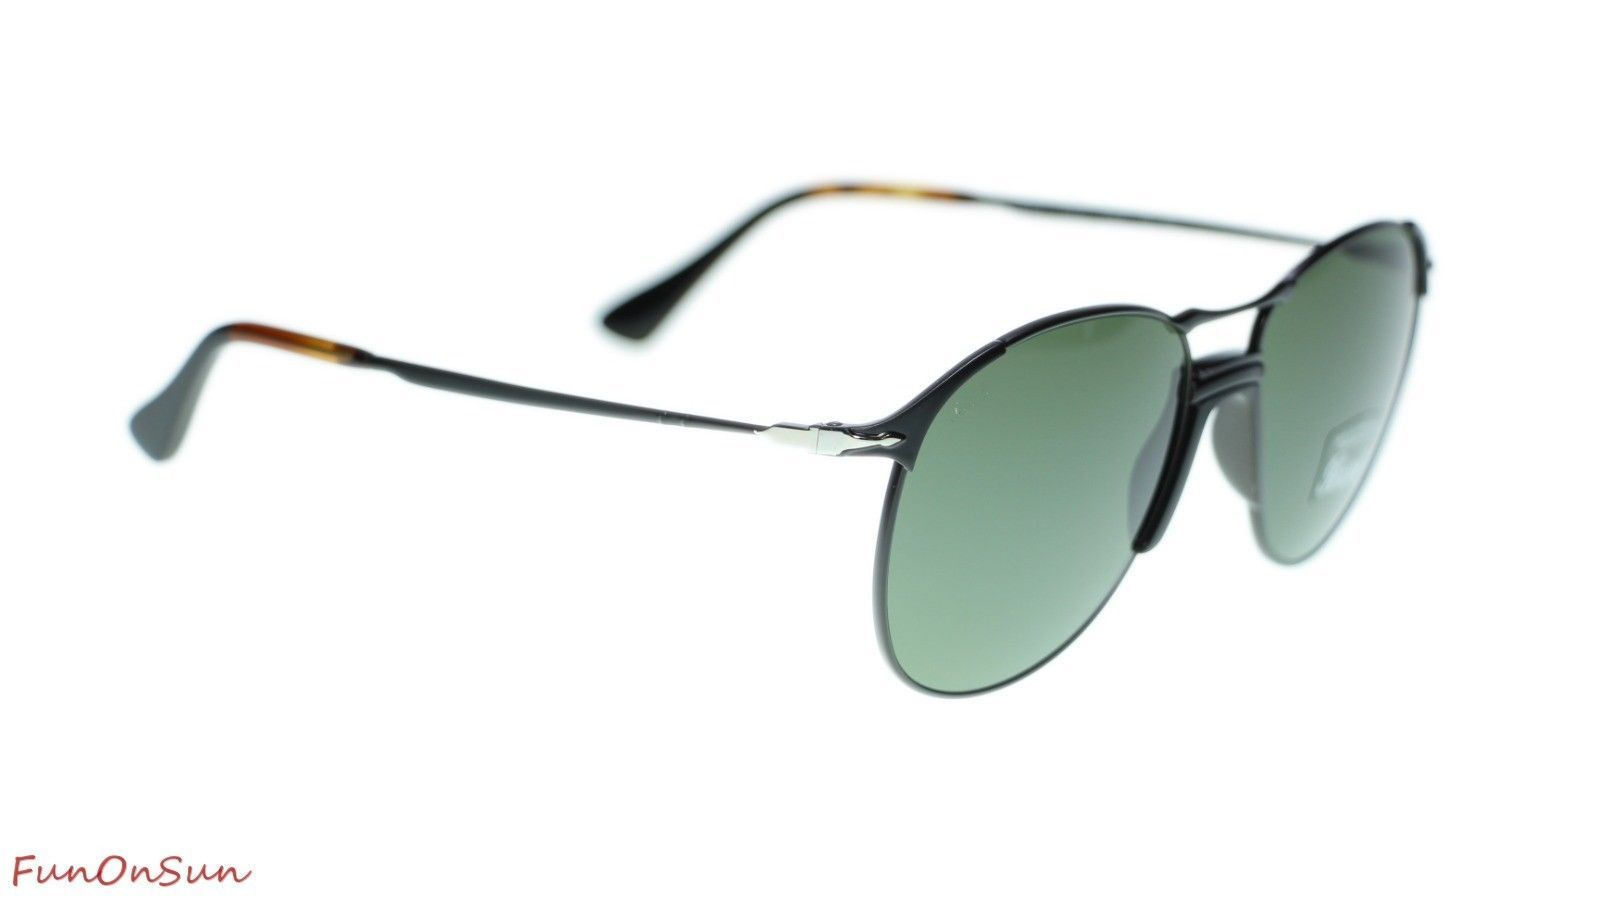 Persol Mens Sunglasses PO2649S 107831 Black/Green Lens 55mm